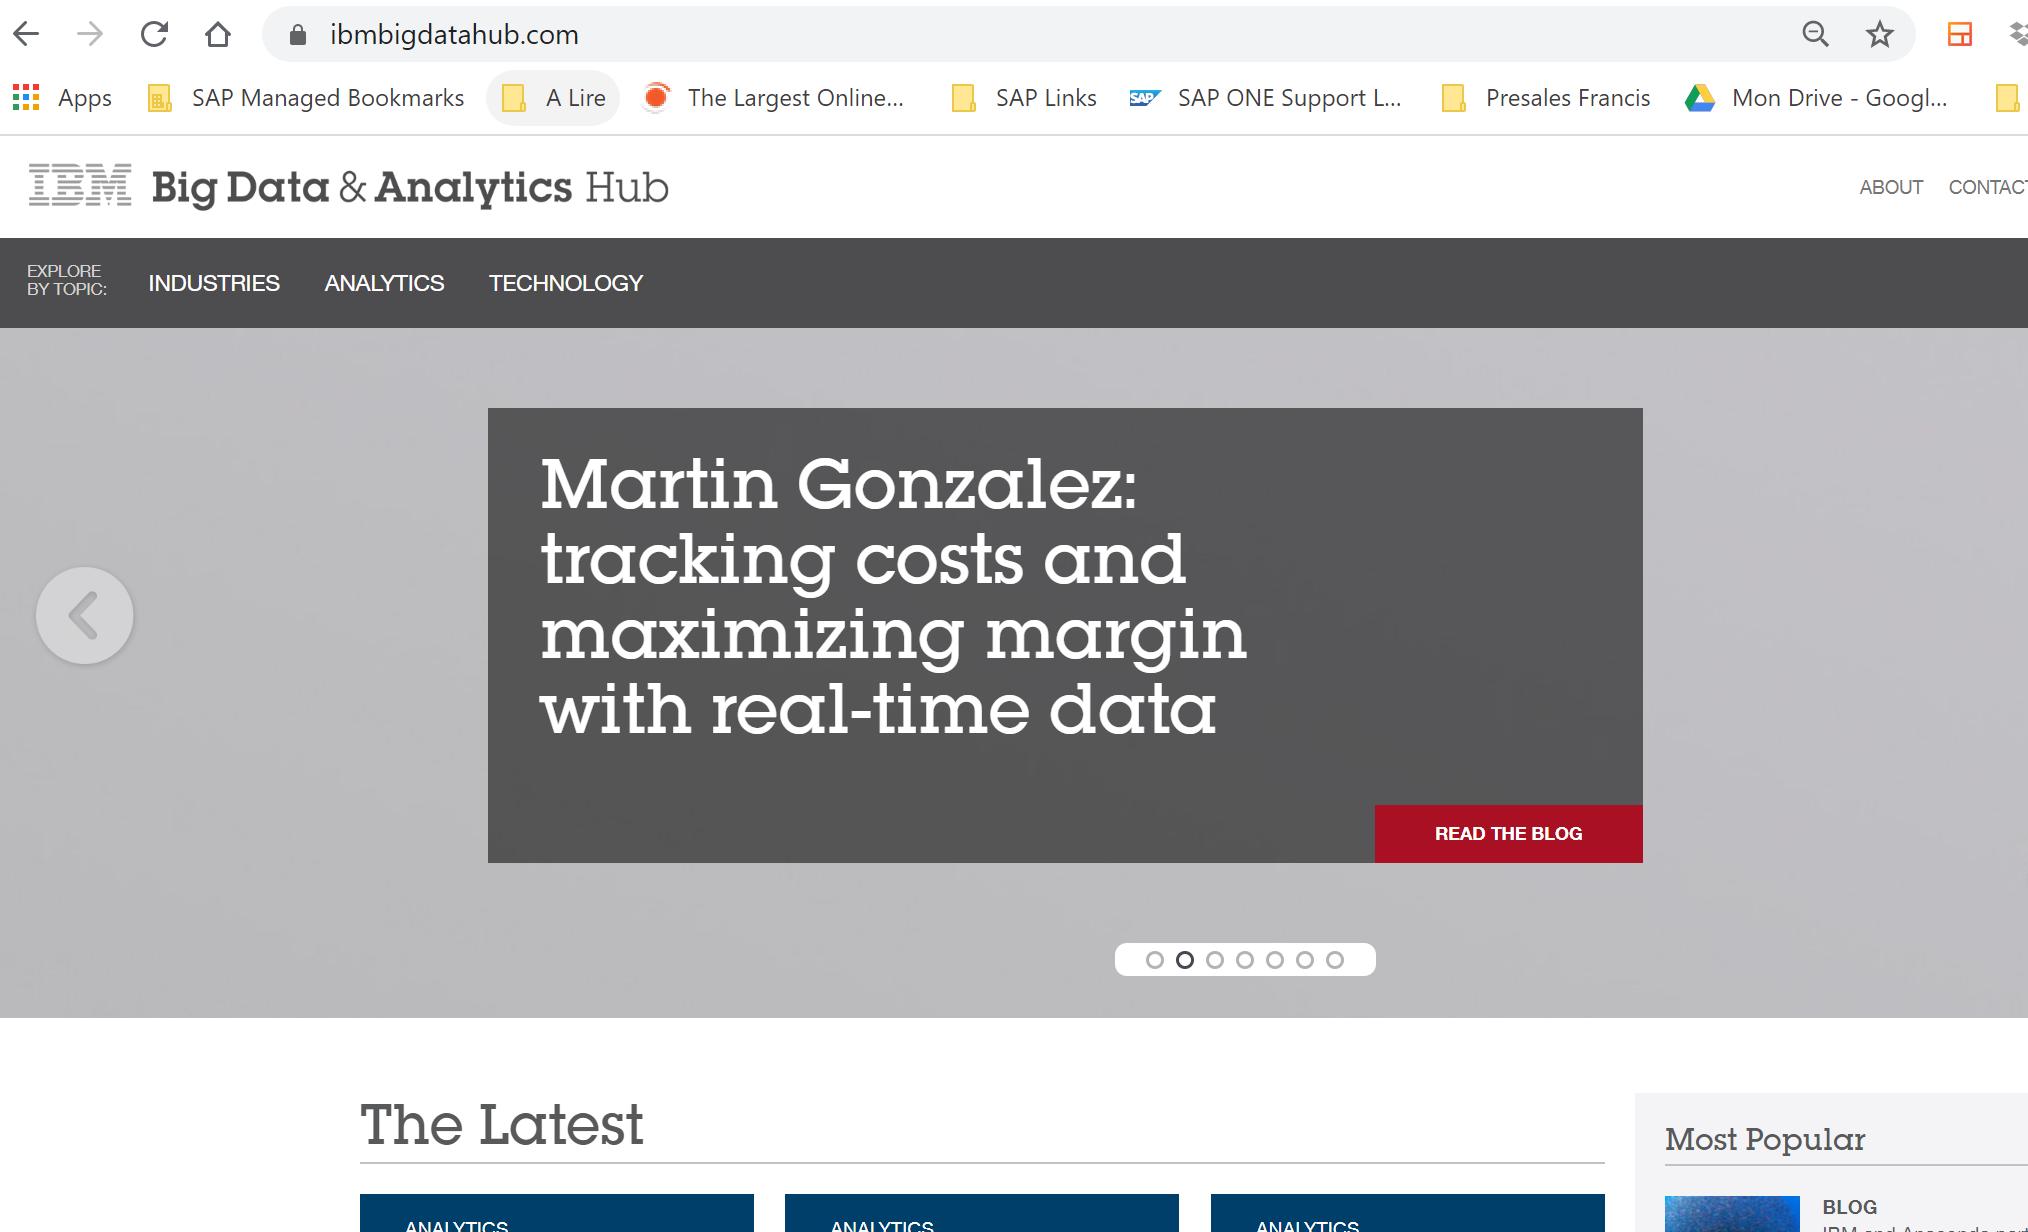 Sites & blogs | IBM Big Data & Analytics Hub